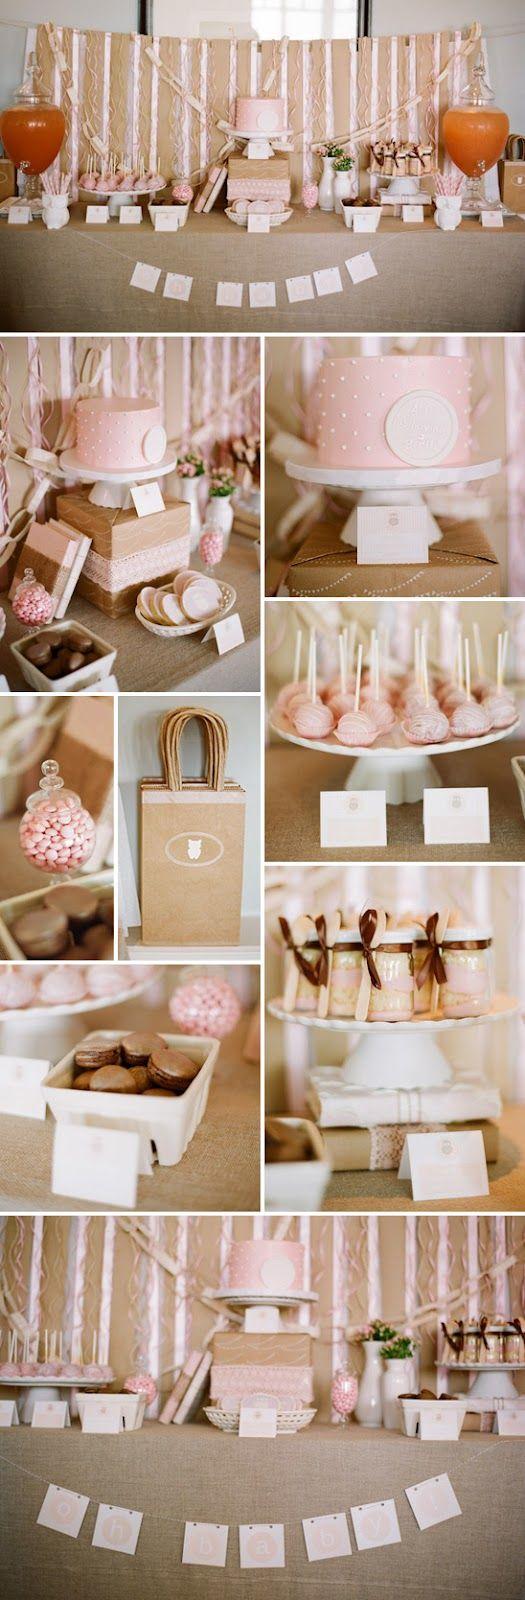 best bridal shower images on pinterest candy buffet birthdays